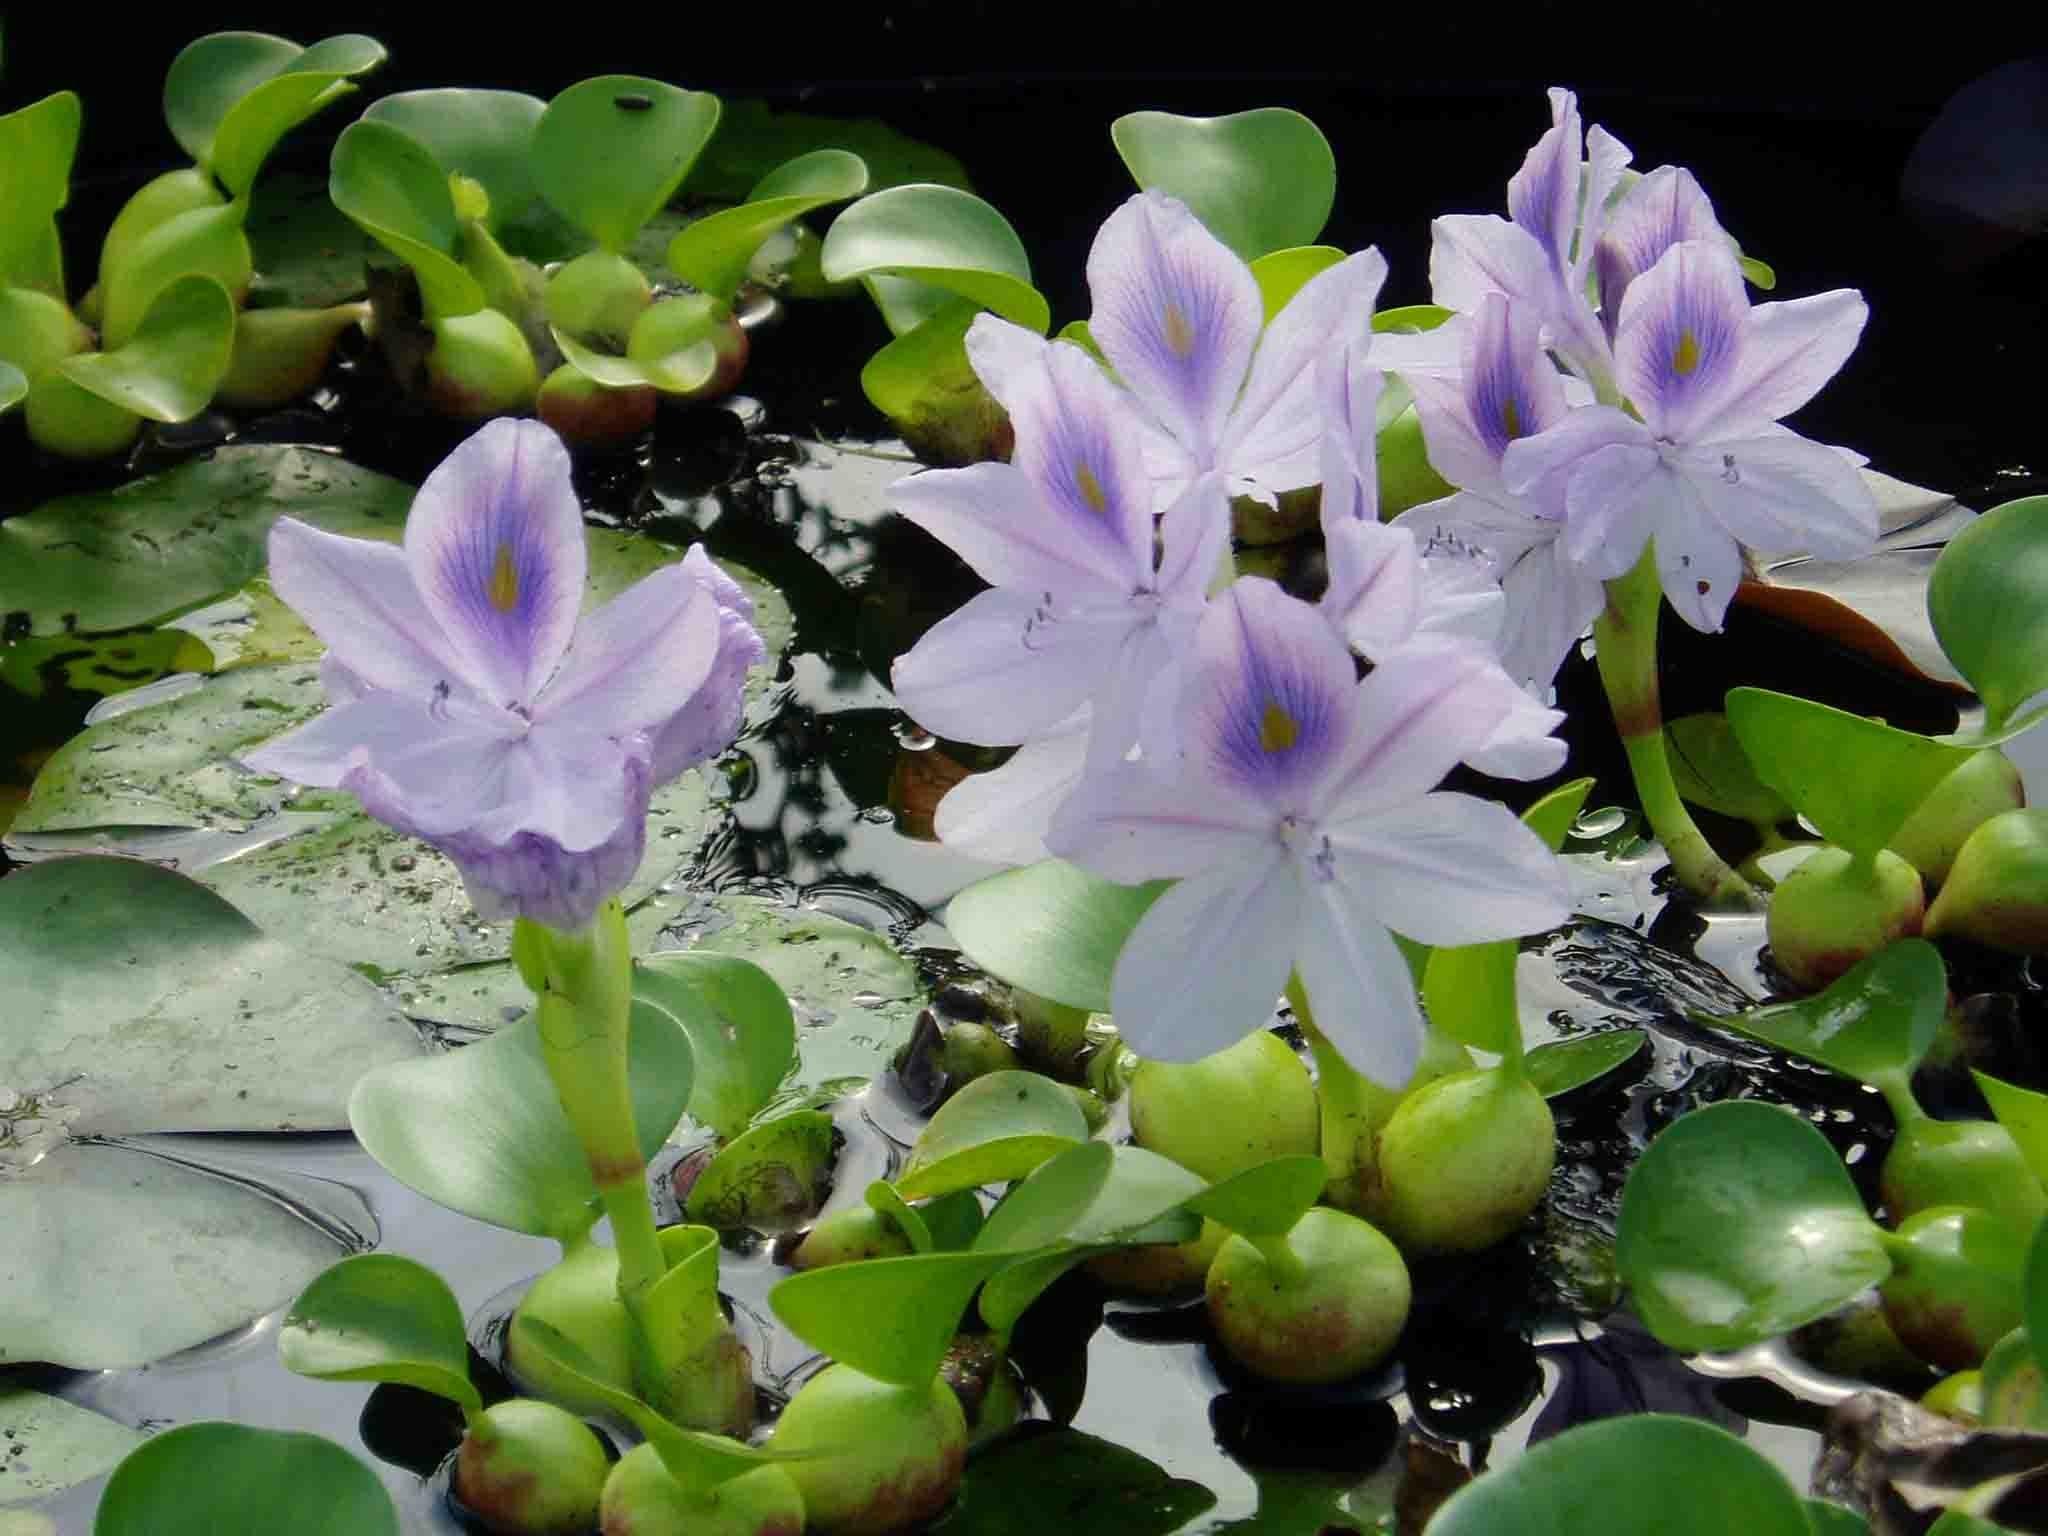 eichornia crassipes jacinthe d 39 eau filtrante bassin le. Black Bedroom Furniture Sets. Home Design Ideas